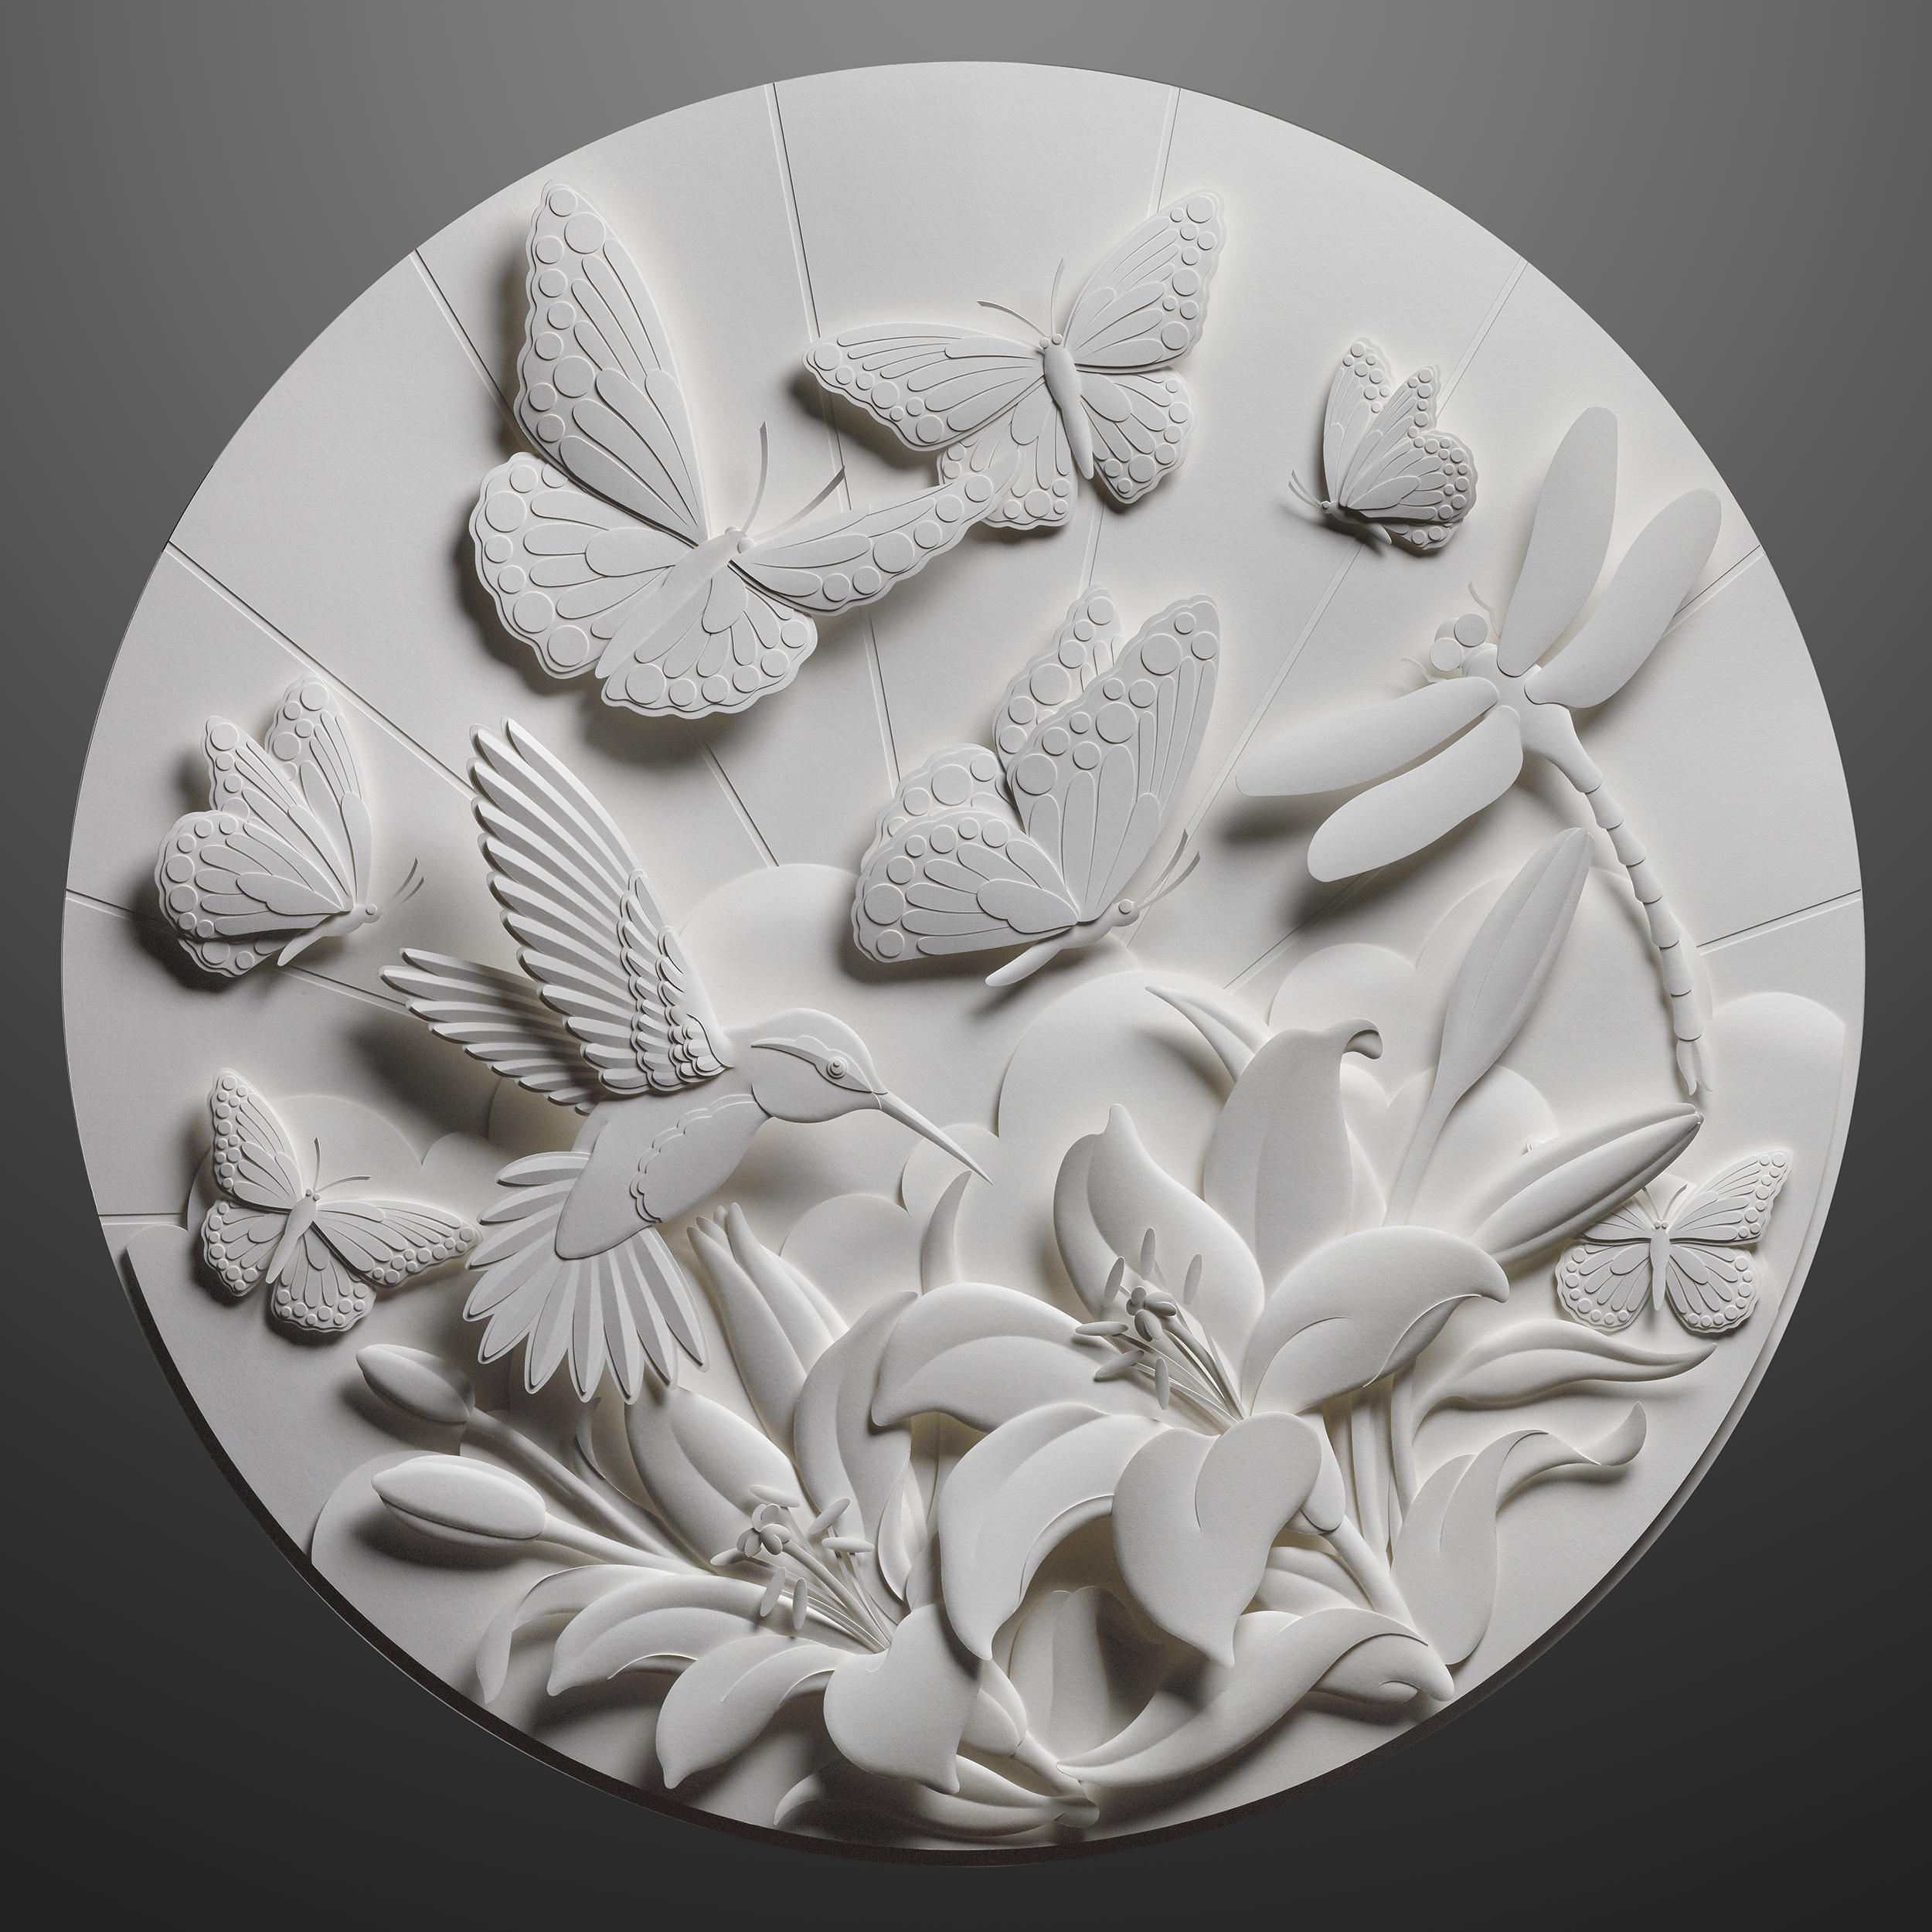 Étonnant Jeff Nishinaka Paper Sculpture WP-27